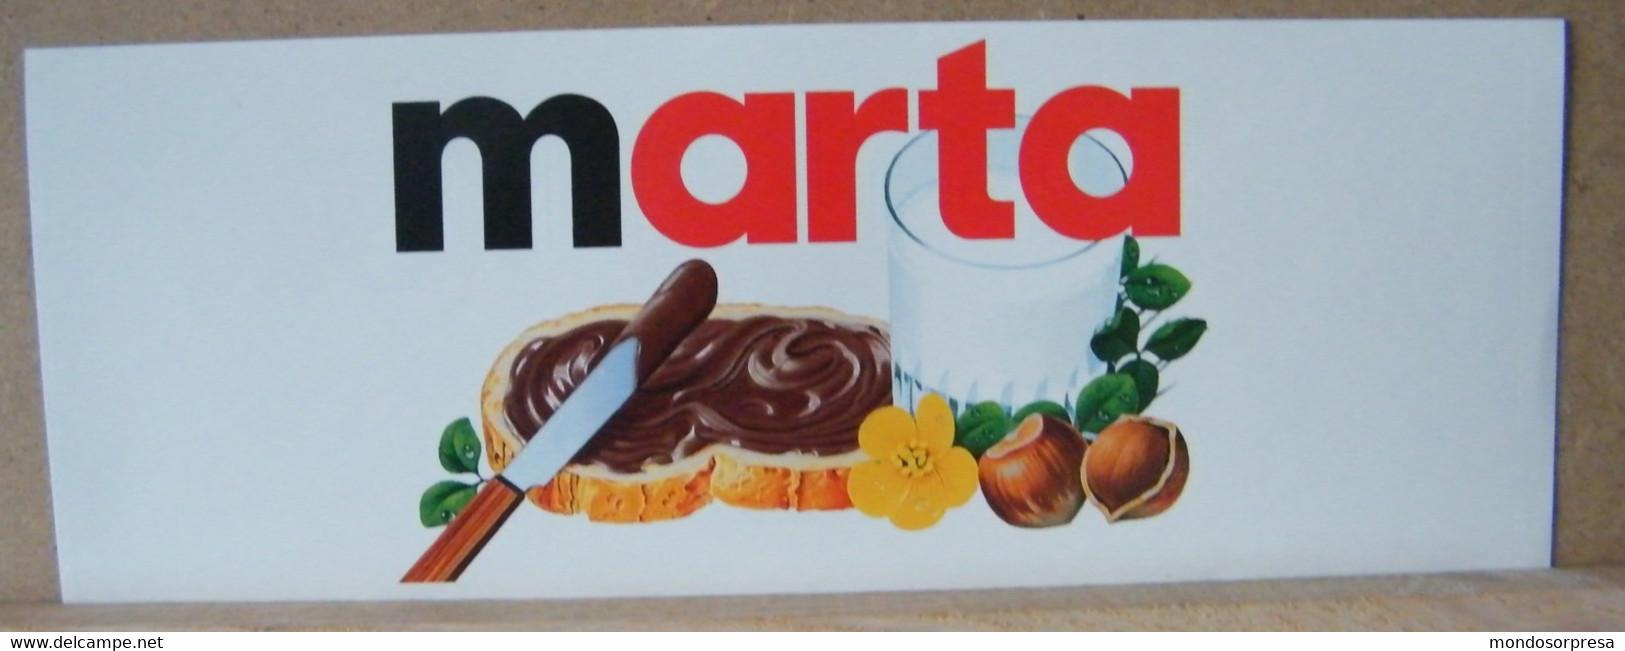 MONDOSORPRESA, ADESIVI NUTELLA NOMI, MARTA - Nutella